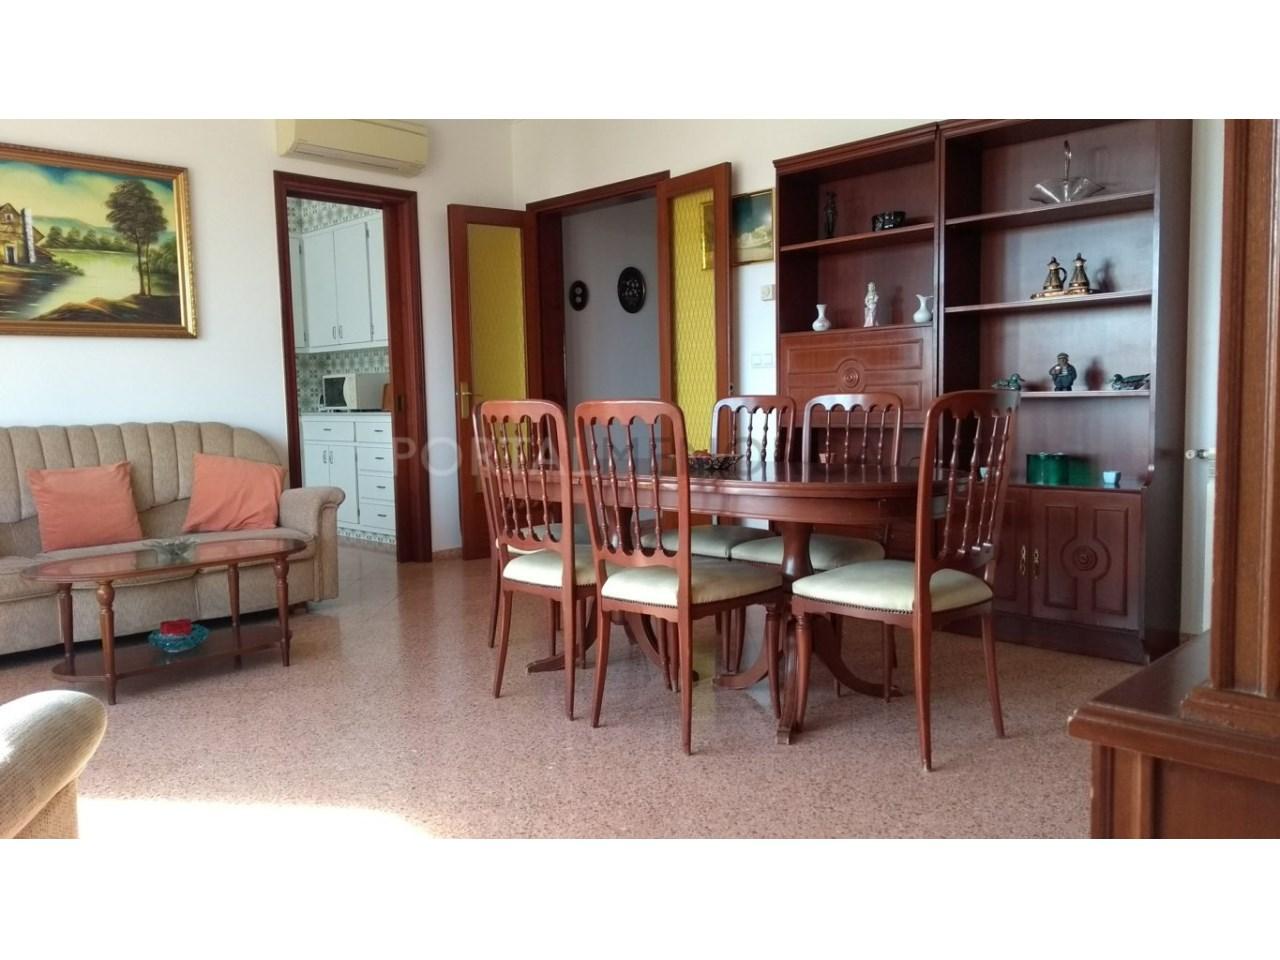 Apartment for sale in Ciutadella-Living room